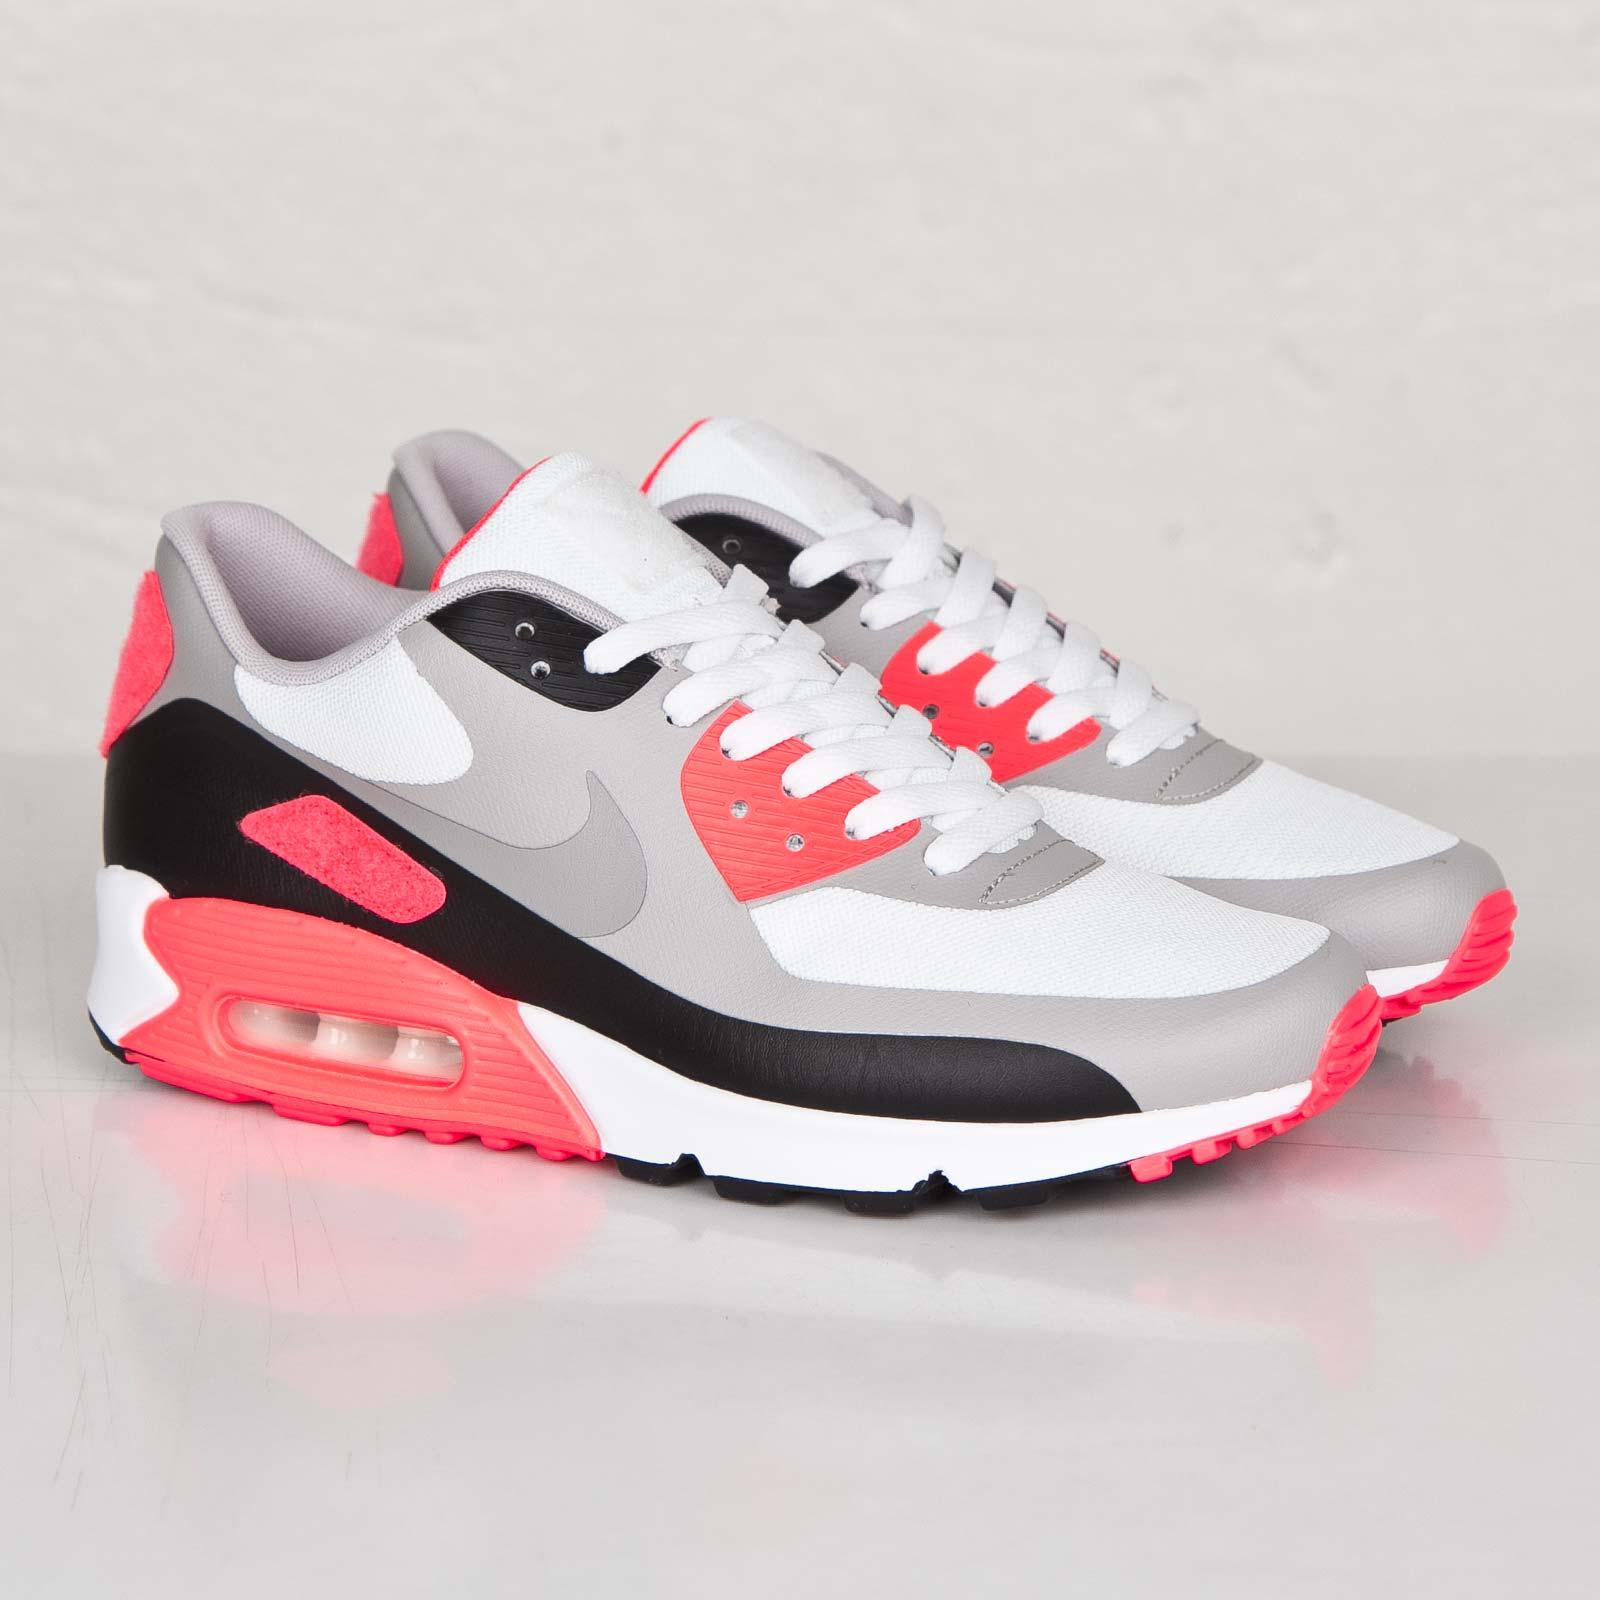 Nike Air Max 90 V SP 746682 106 Sneakersnstuff